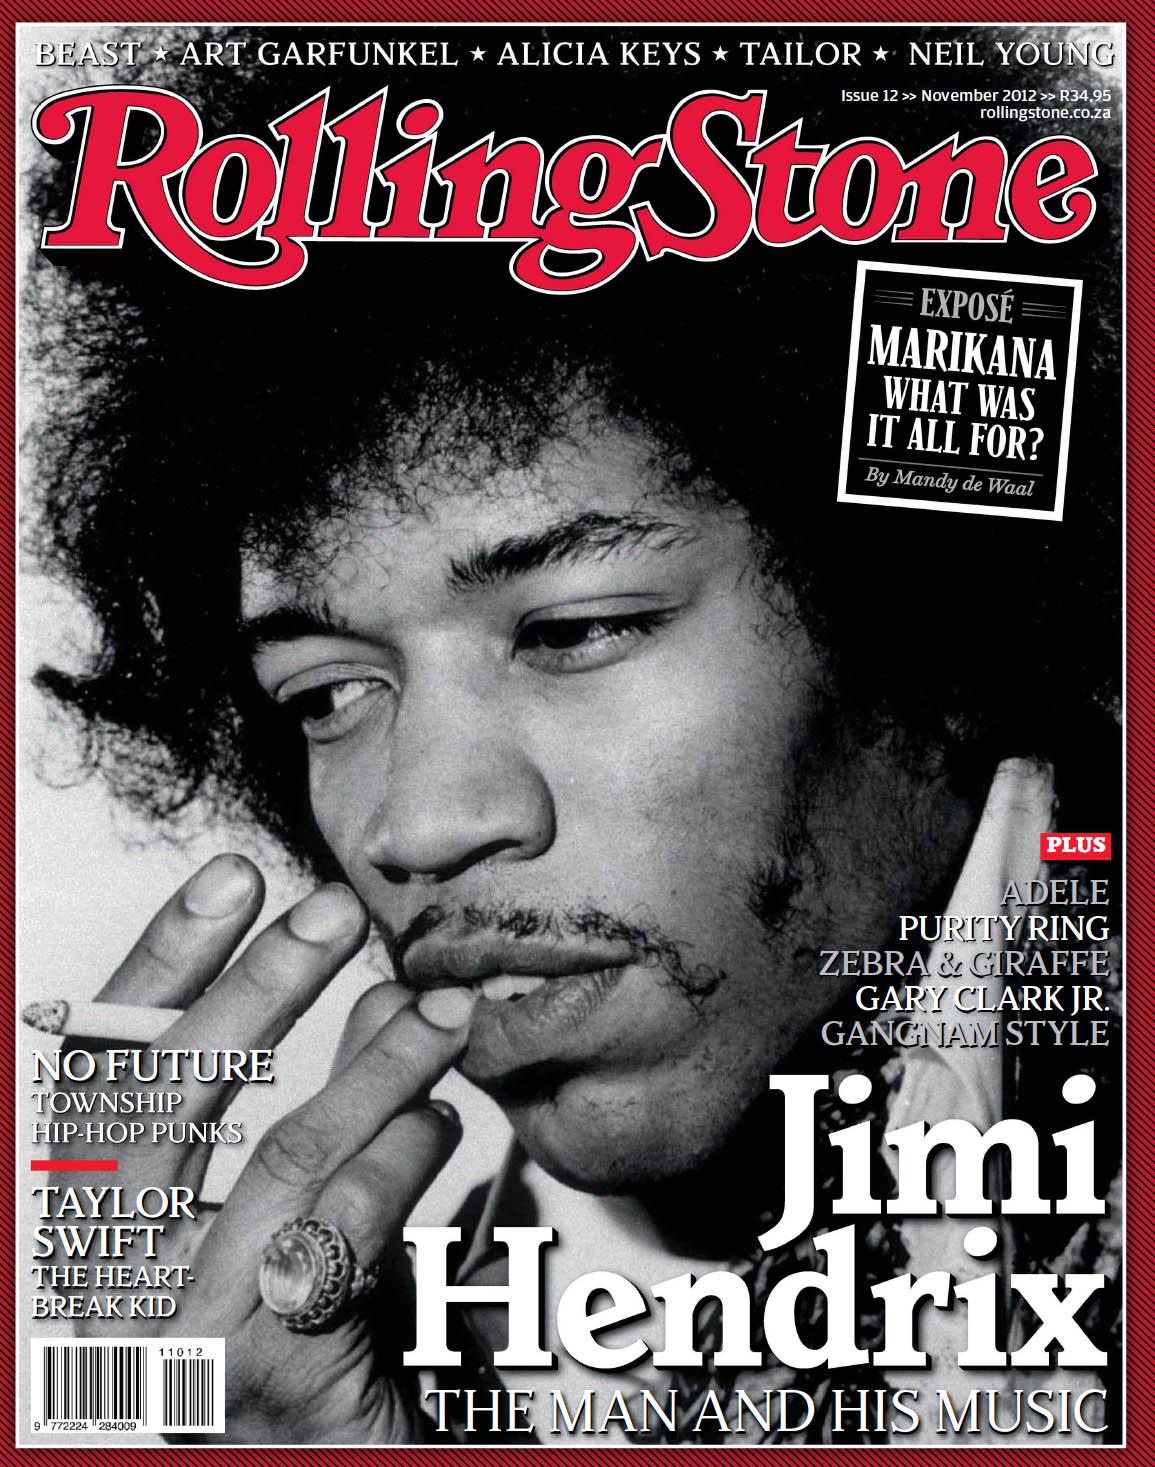 Vintage Rolling Stone Magazine October 11, 1973 #145 - Art Garfunkel - Santana